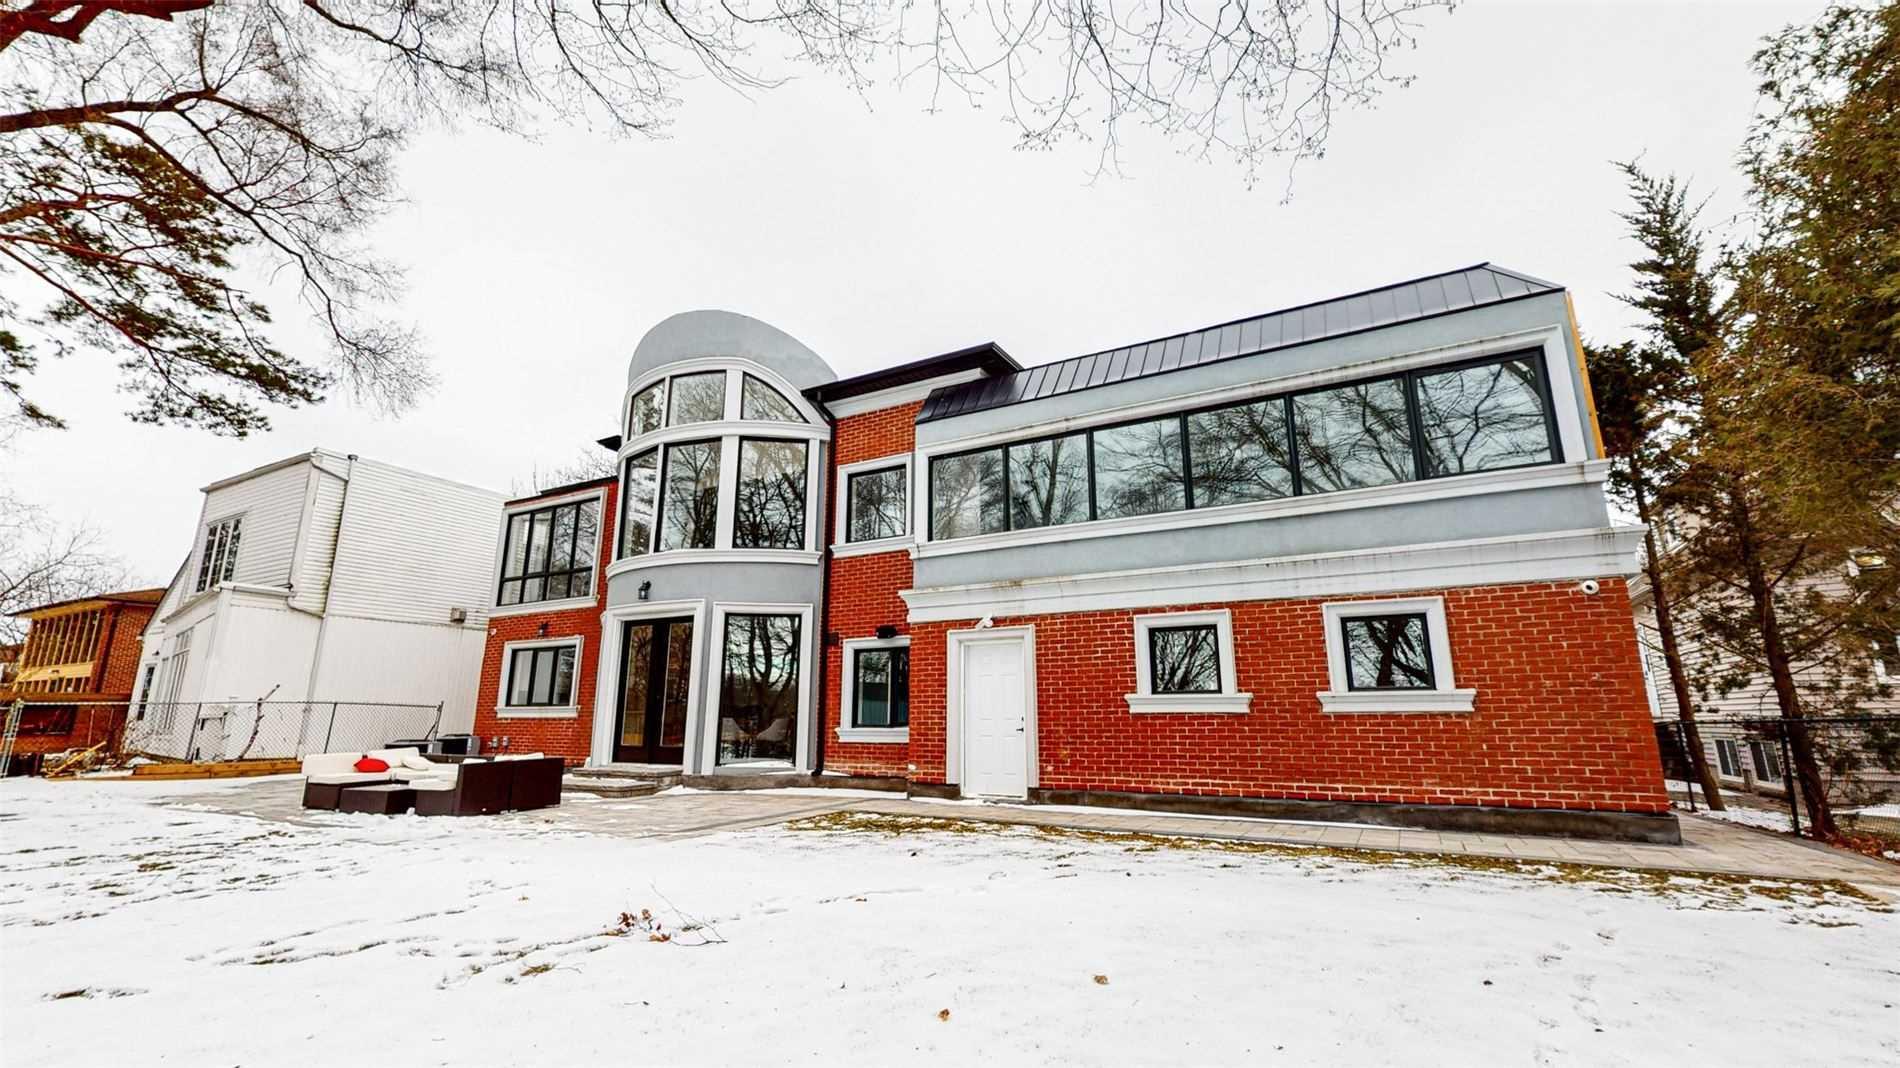 219 Rouge Hills Dr, Toronto, Ontario M1C2Y9, 4 Bedrooms Bedrooms, 10 Rooms Rooms,6 BathroomsBathrooms,Detached,For Sale,Rouge Hills,E5105514